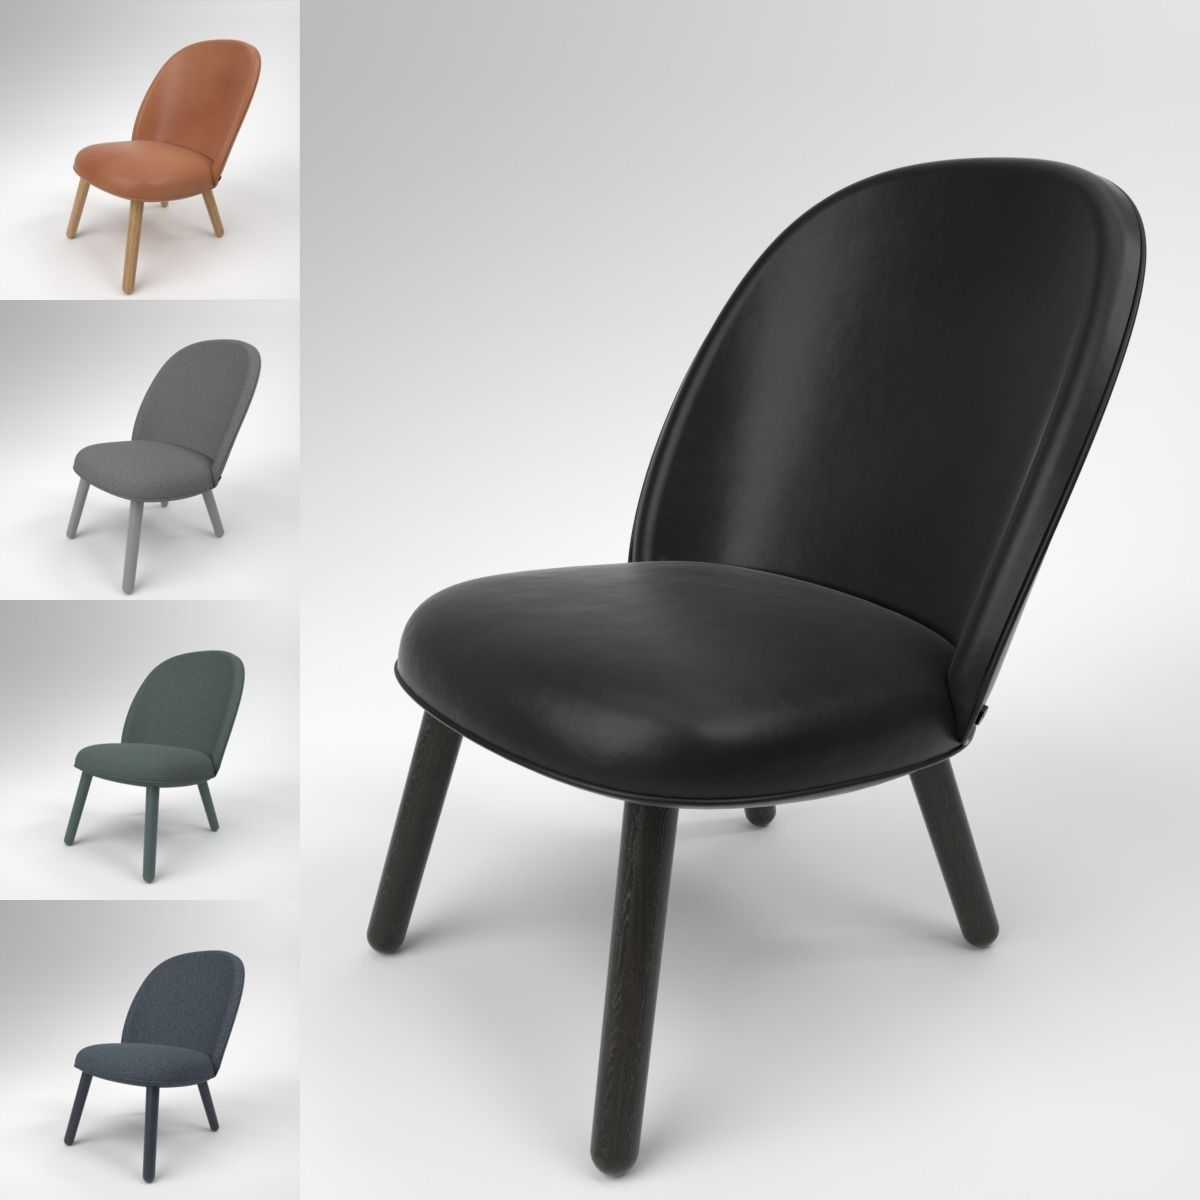 Phenomenal Normann Copenhagen Ace Lounge Chair Blender Cycles 3D Model Camellatalisay Diy Chair Ideas Camellatalisaycom